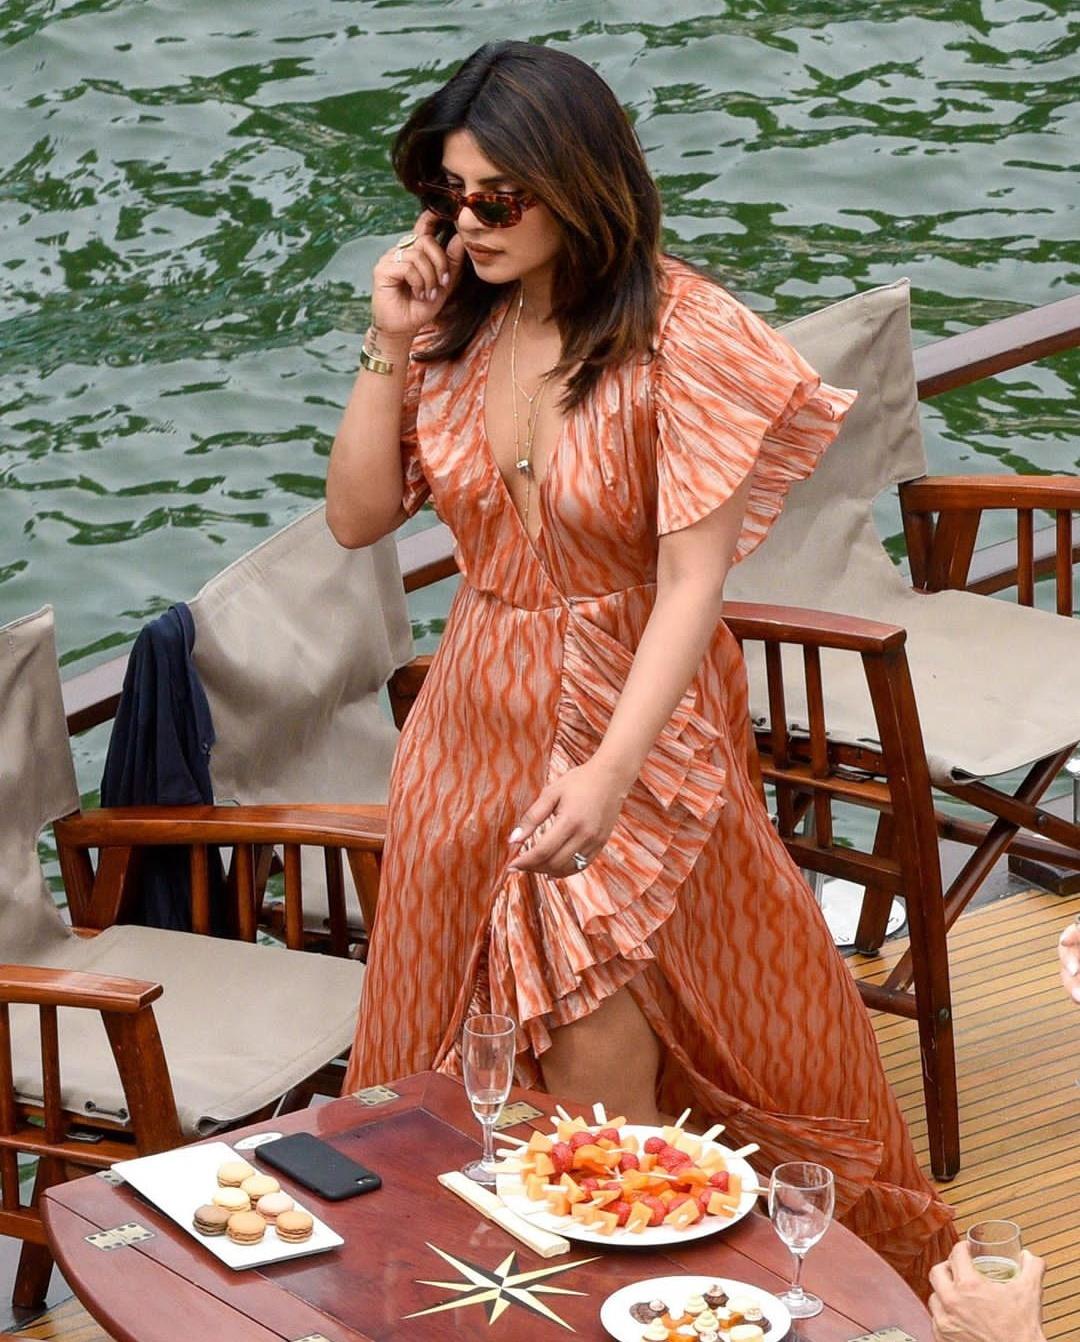 Priyanka Chopra And Nick Jonas' Pictures from the Jonas Parisian Cruise Goes Viral